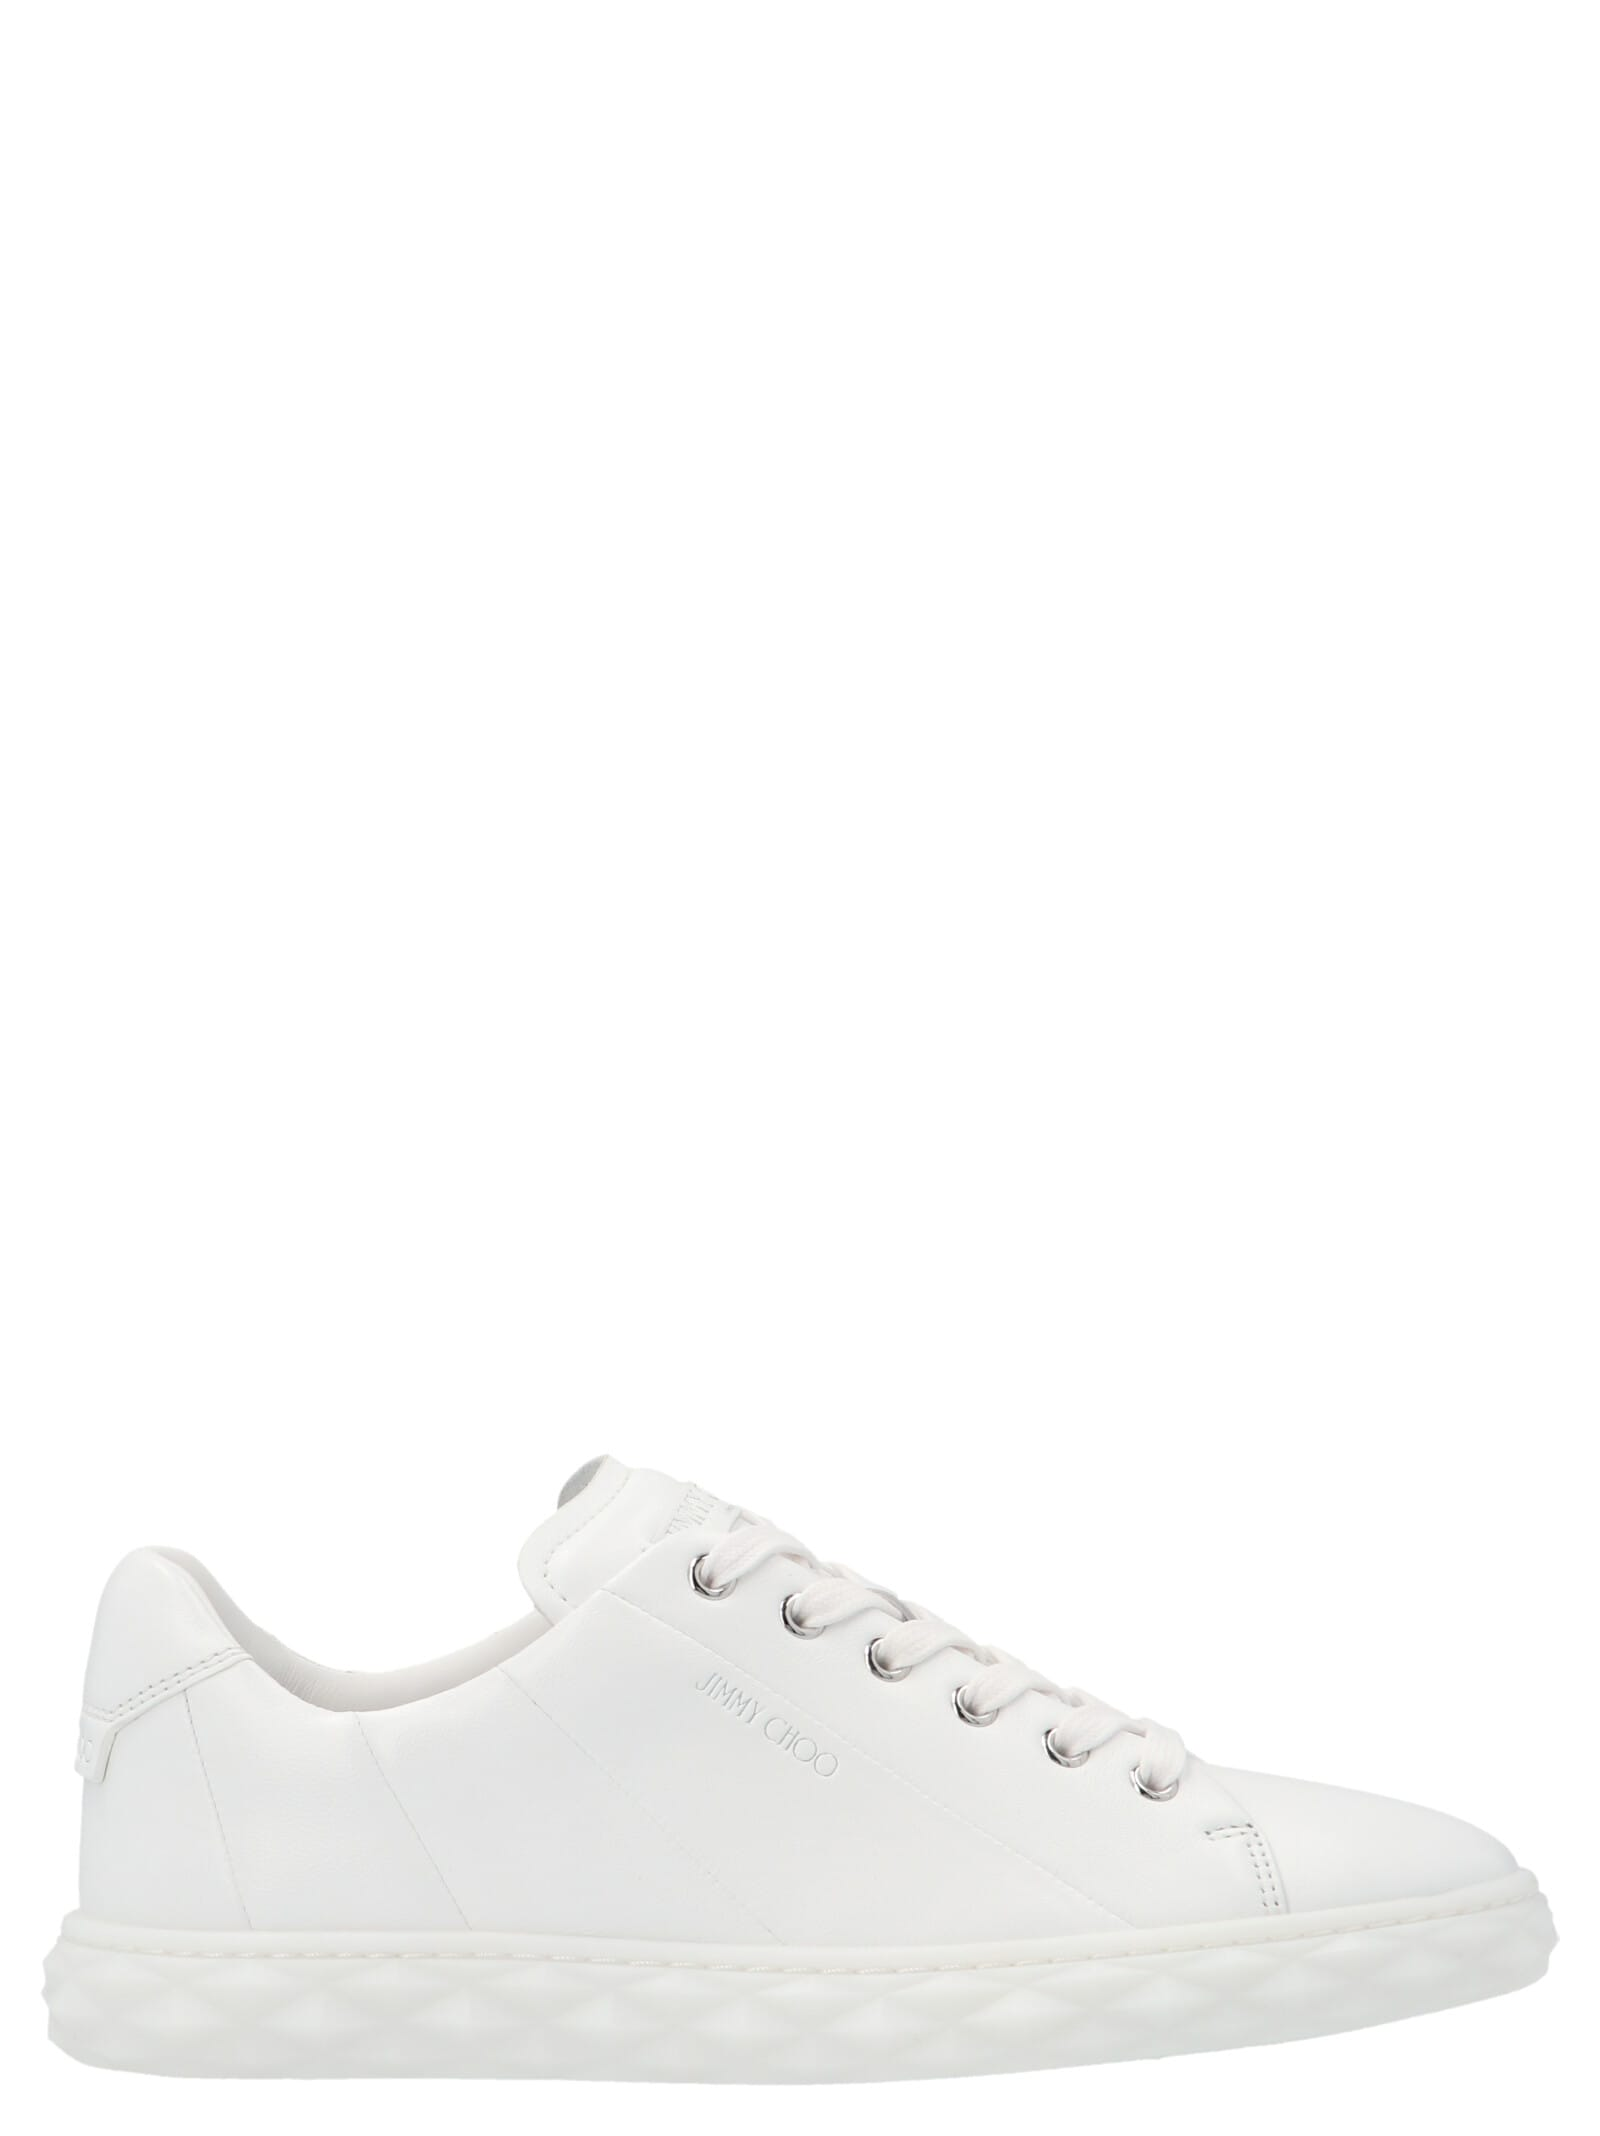 Jimmy Choo Sneakers DIAMOND LIGHT SHOES